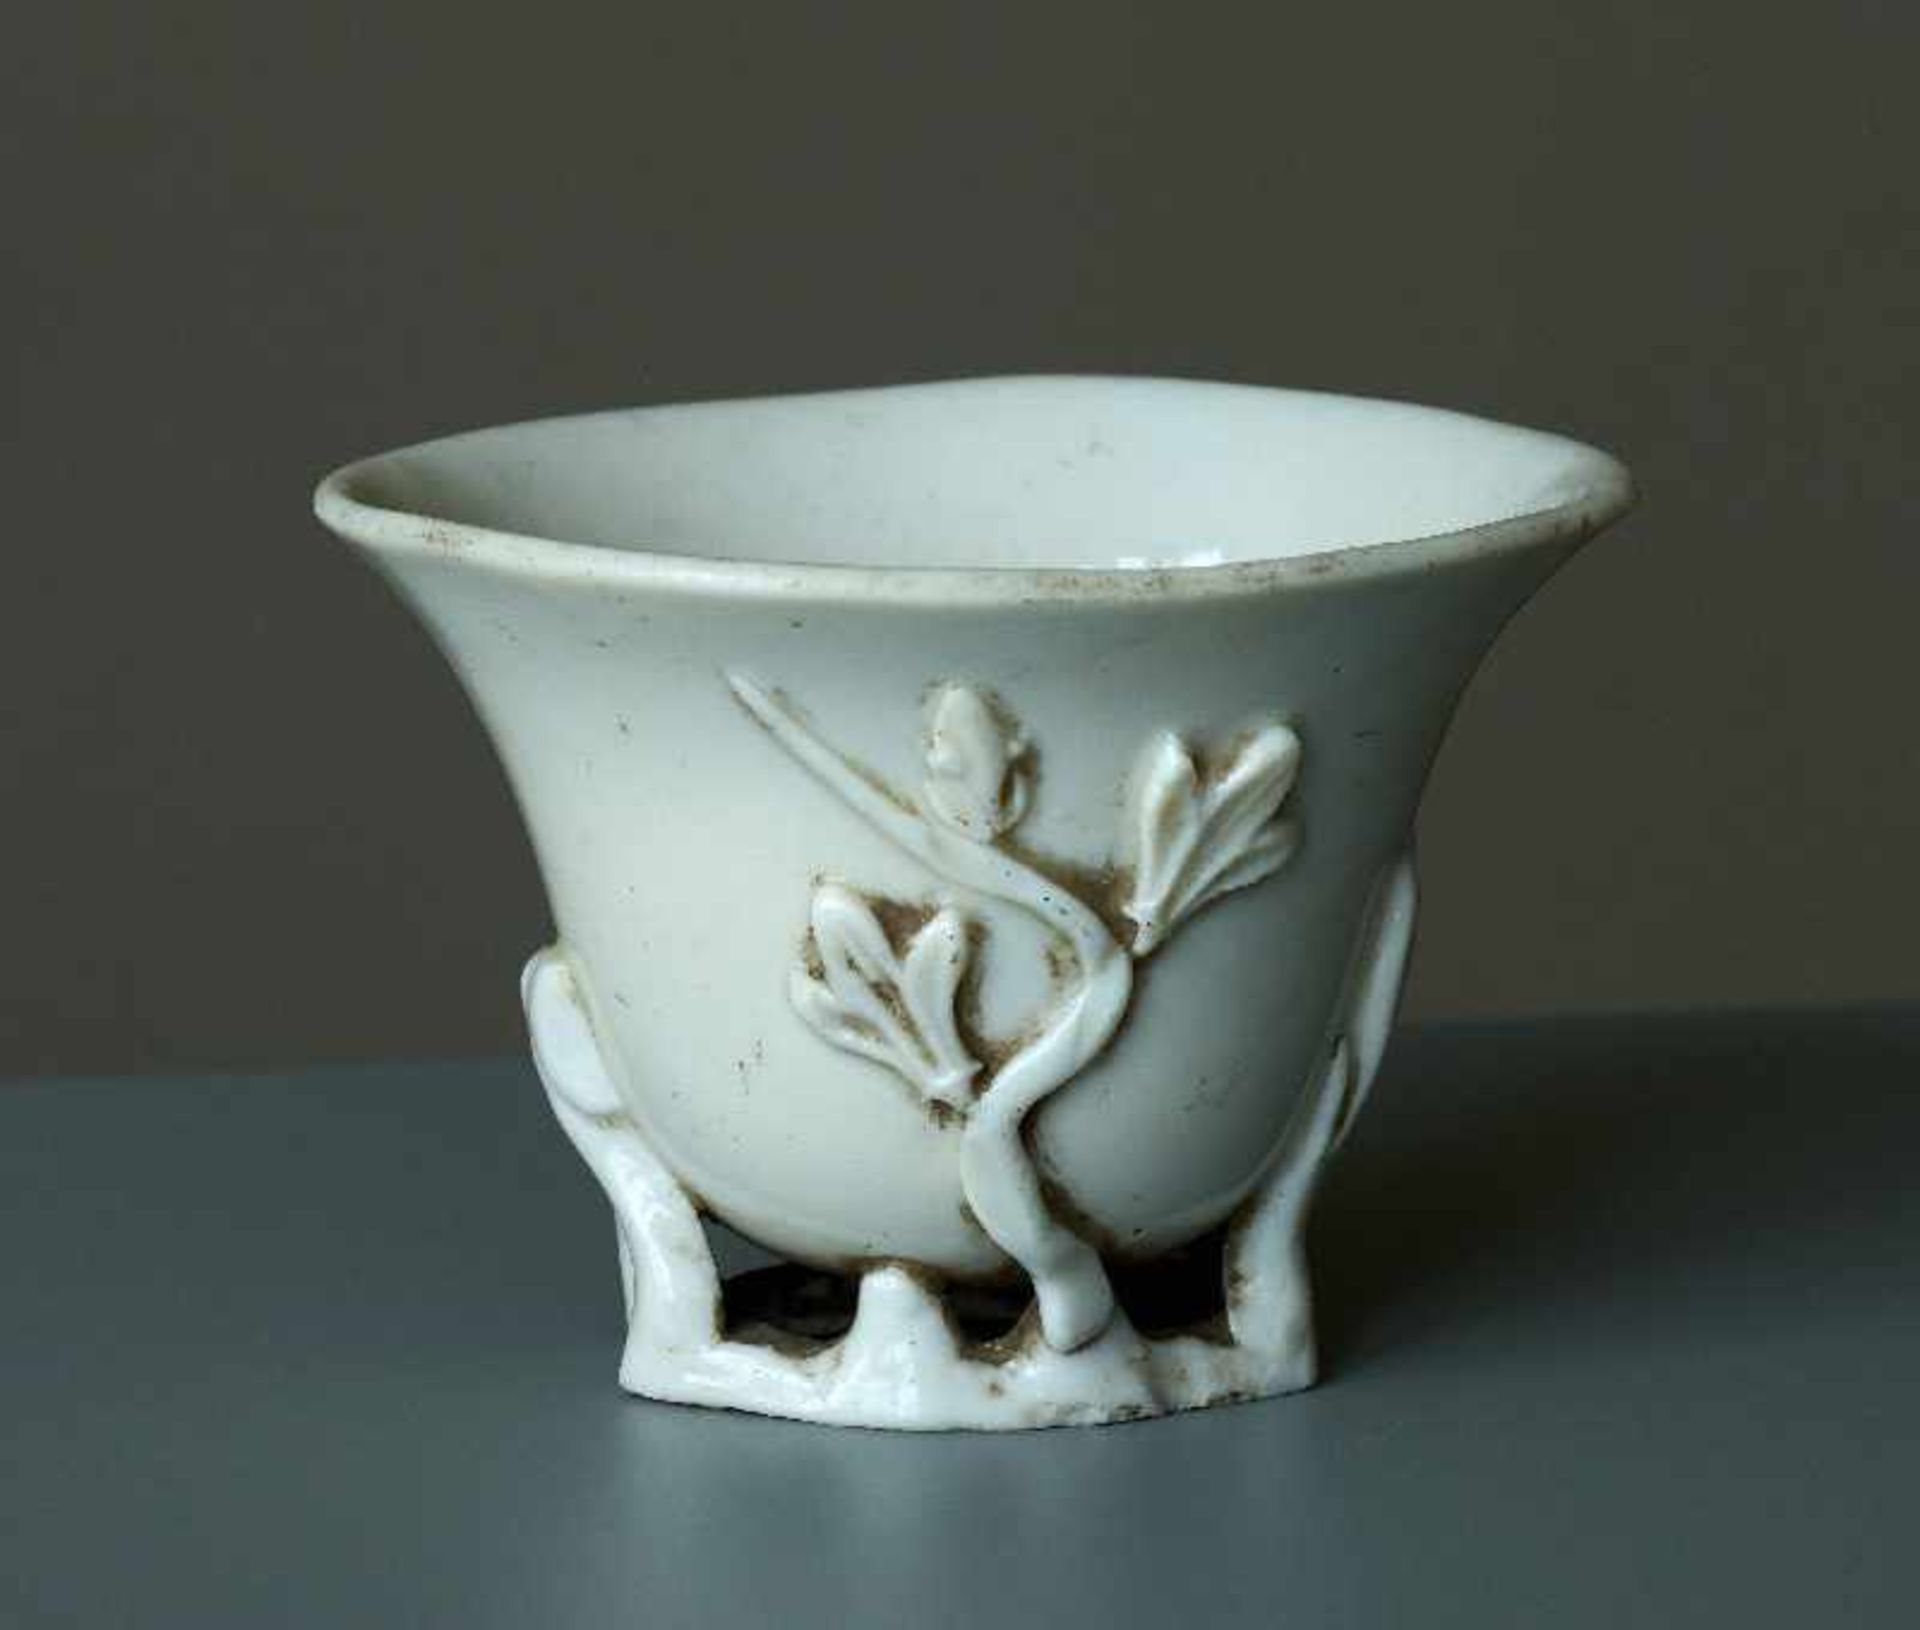 KLEINER BECHER Blanc de Chine-Porzellan. China, Qing-Dynastie Miniaturbecher in ovaler,